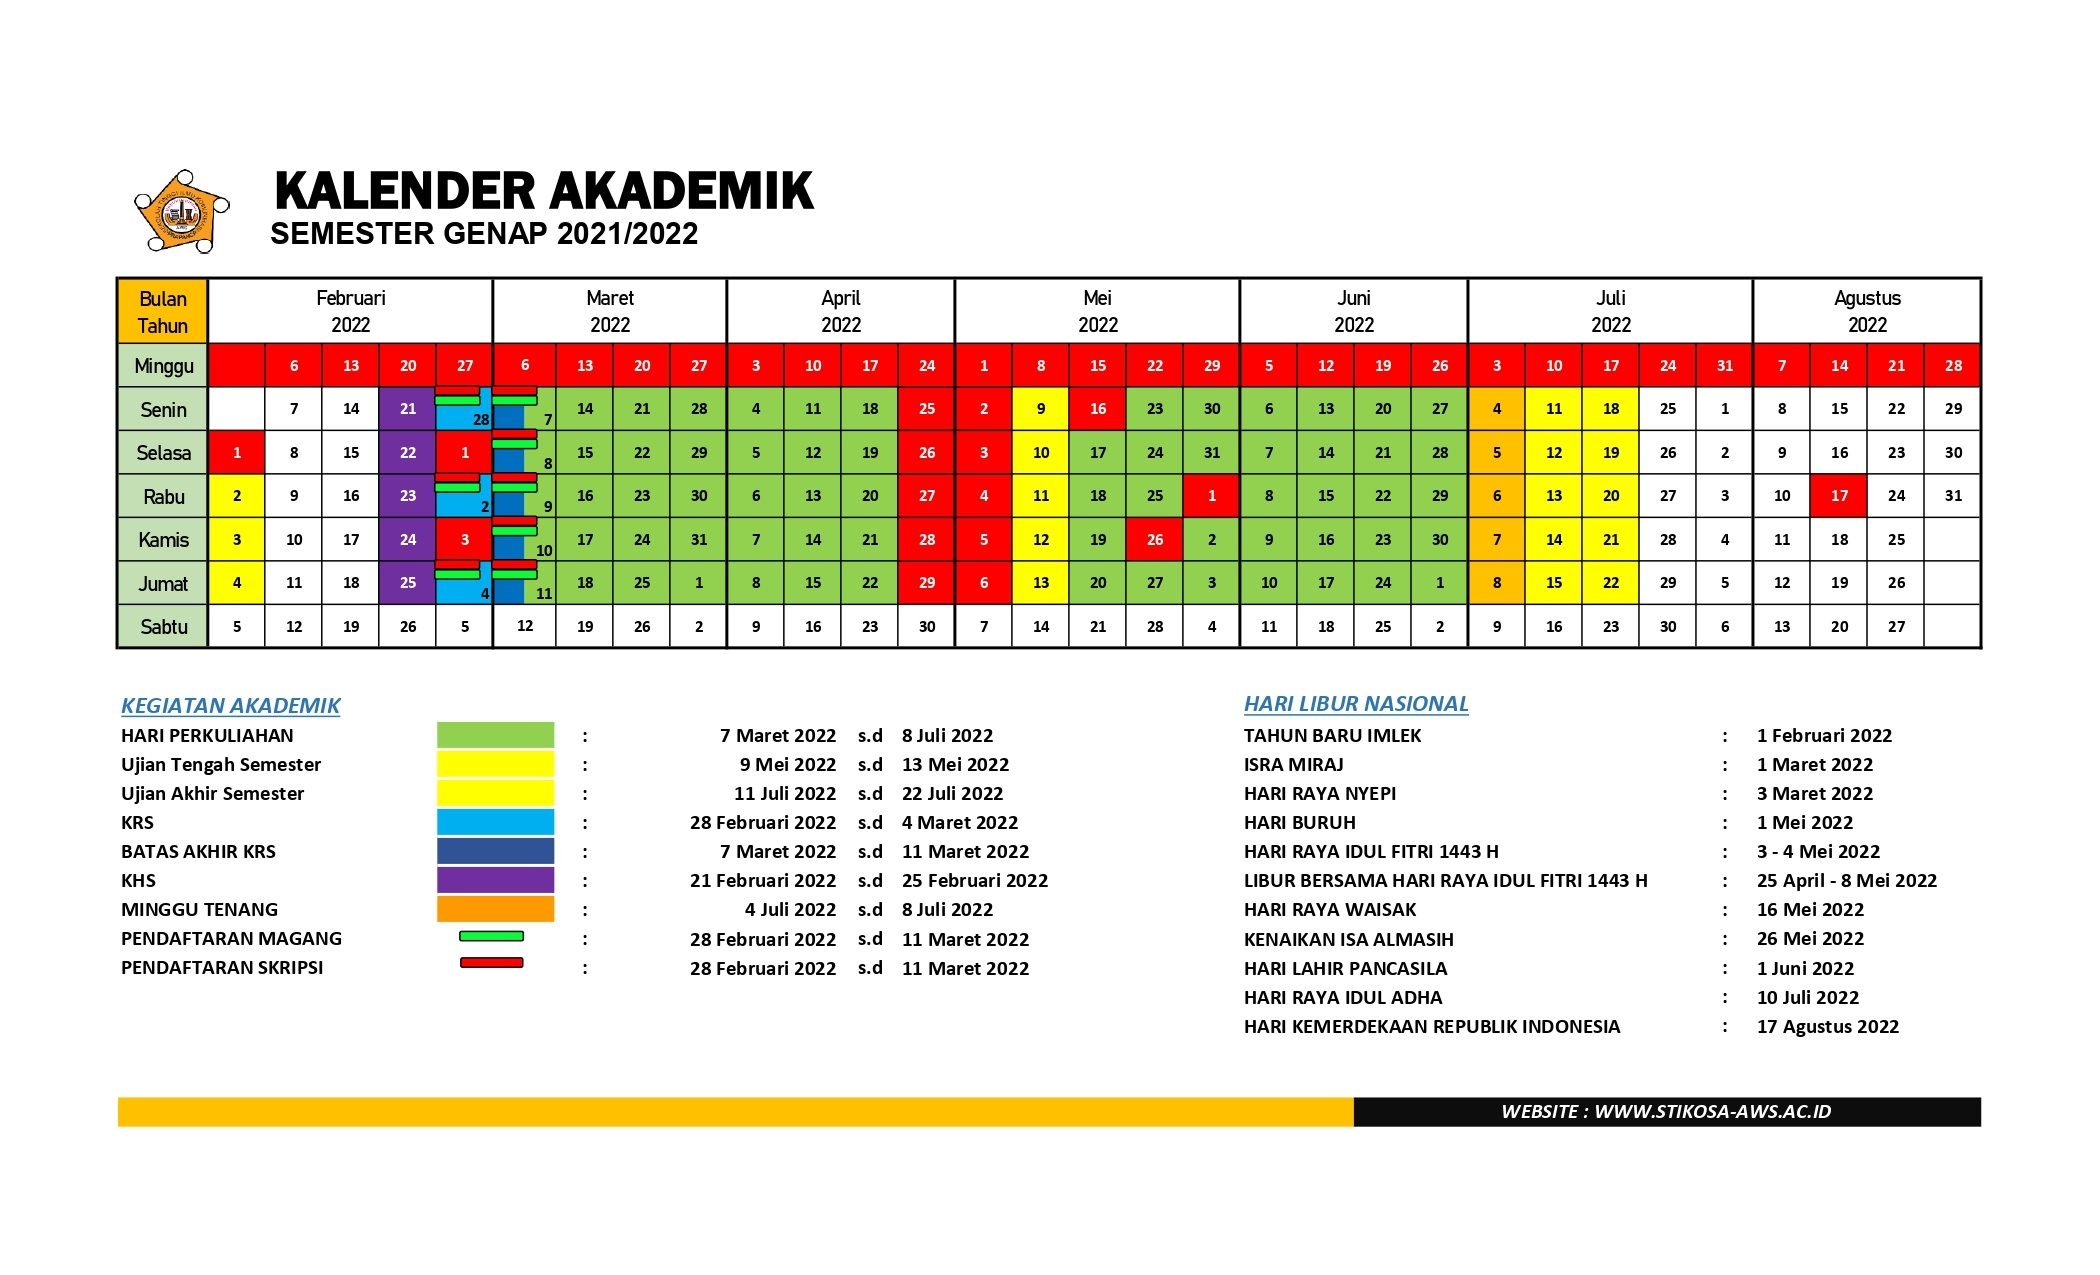 Kalender Akademik 2021-2022 Rev.3_page-0002